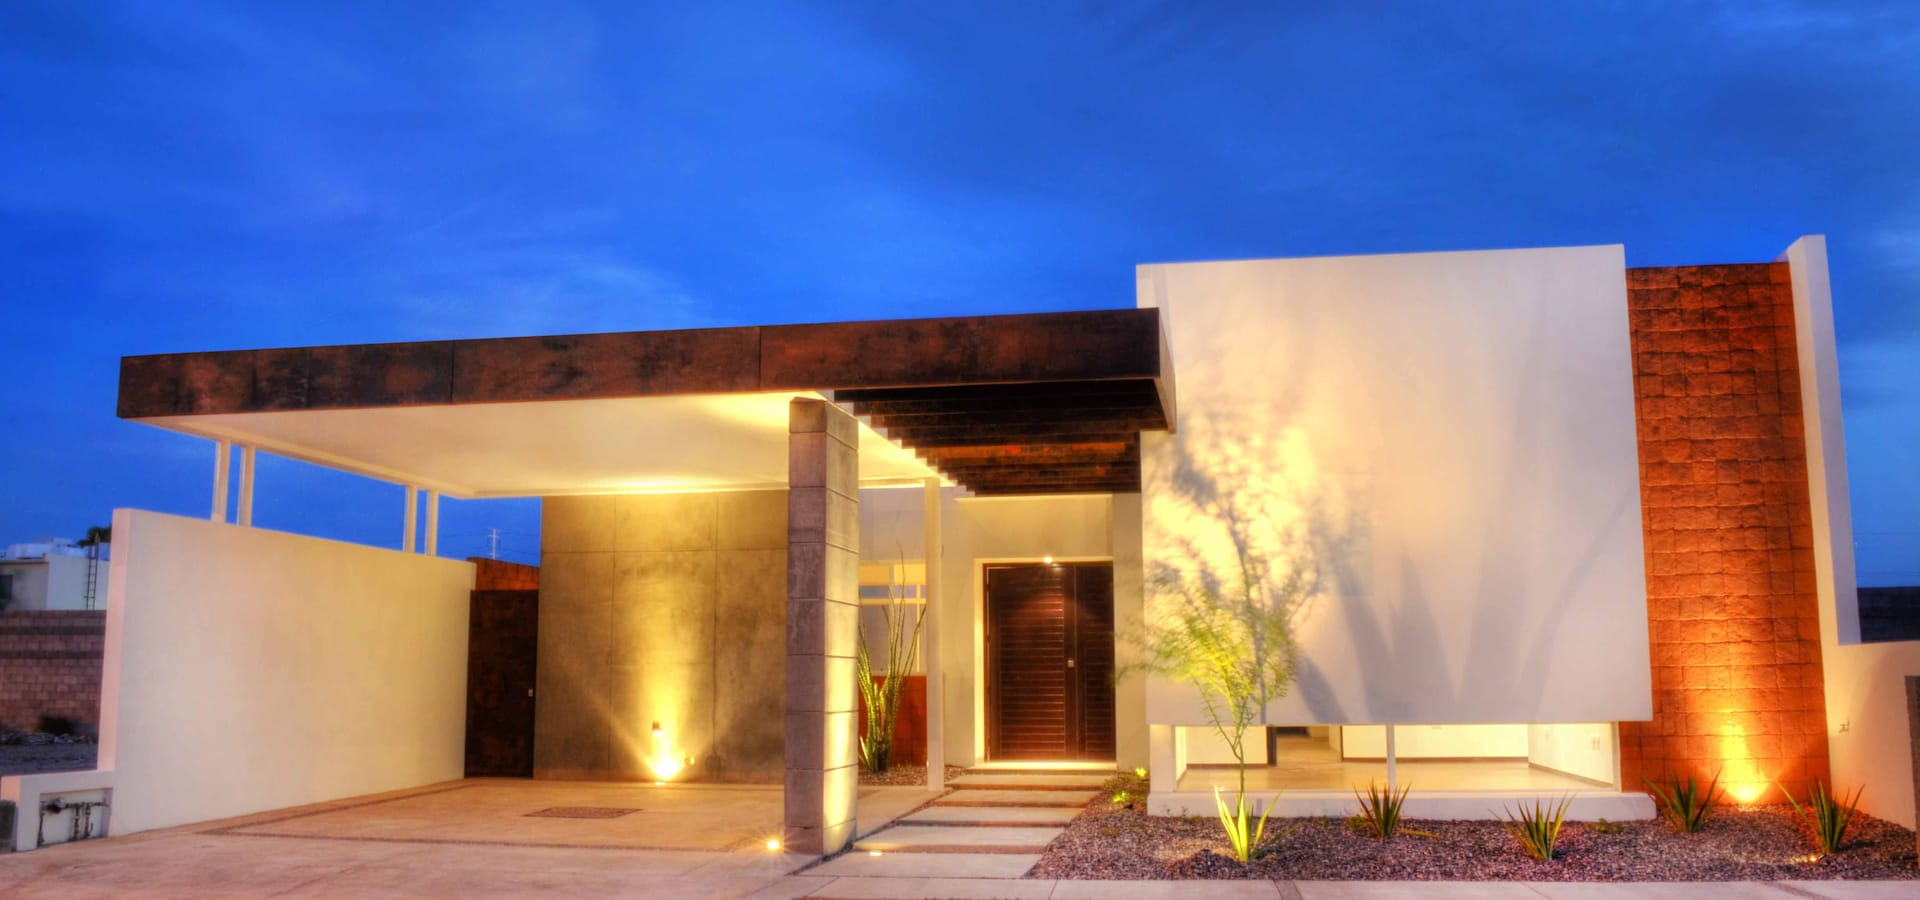 TABB Architecture